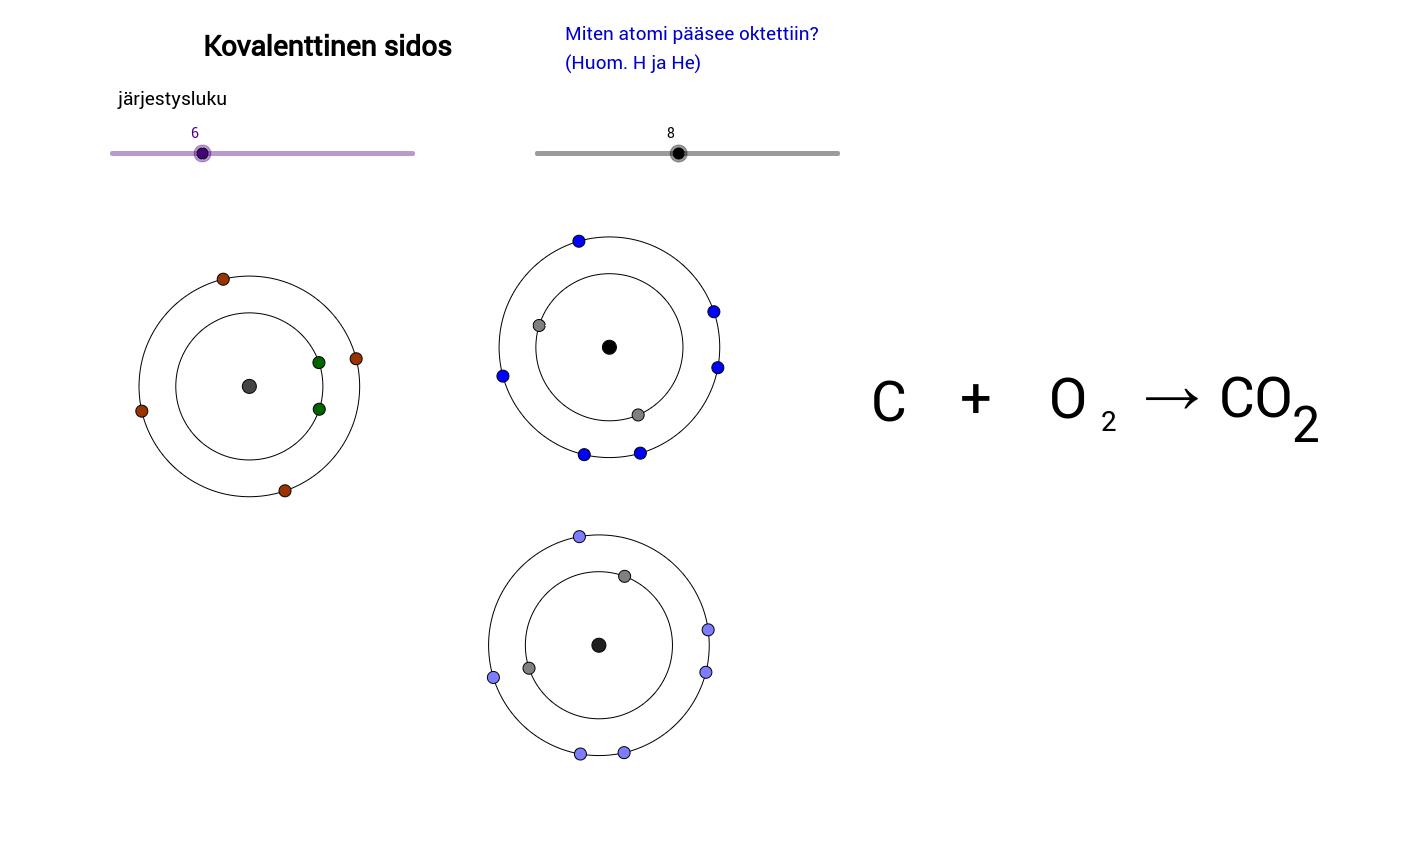 Kovalenttinen sidos